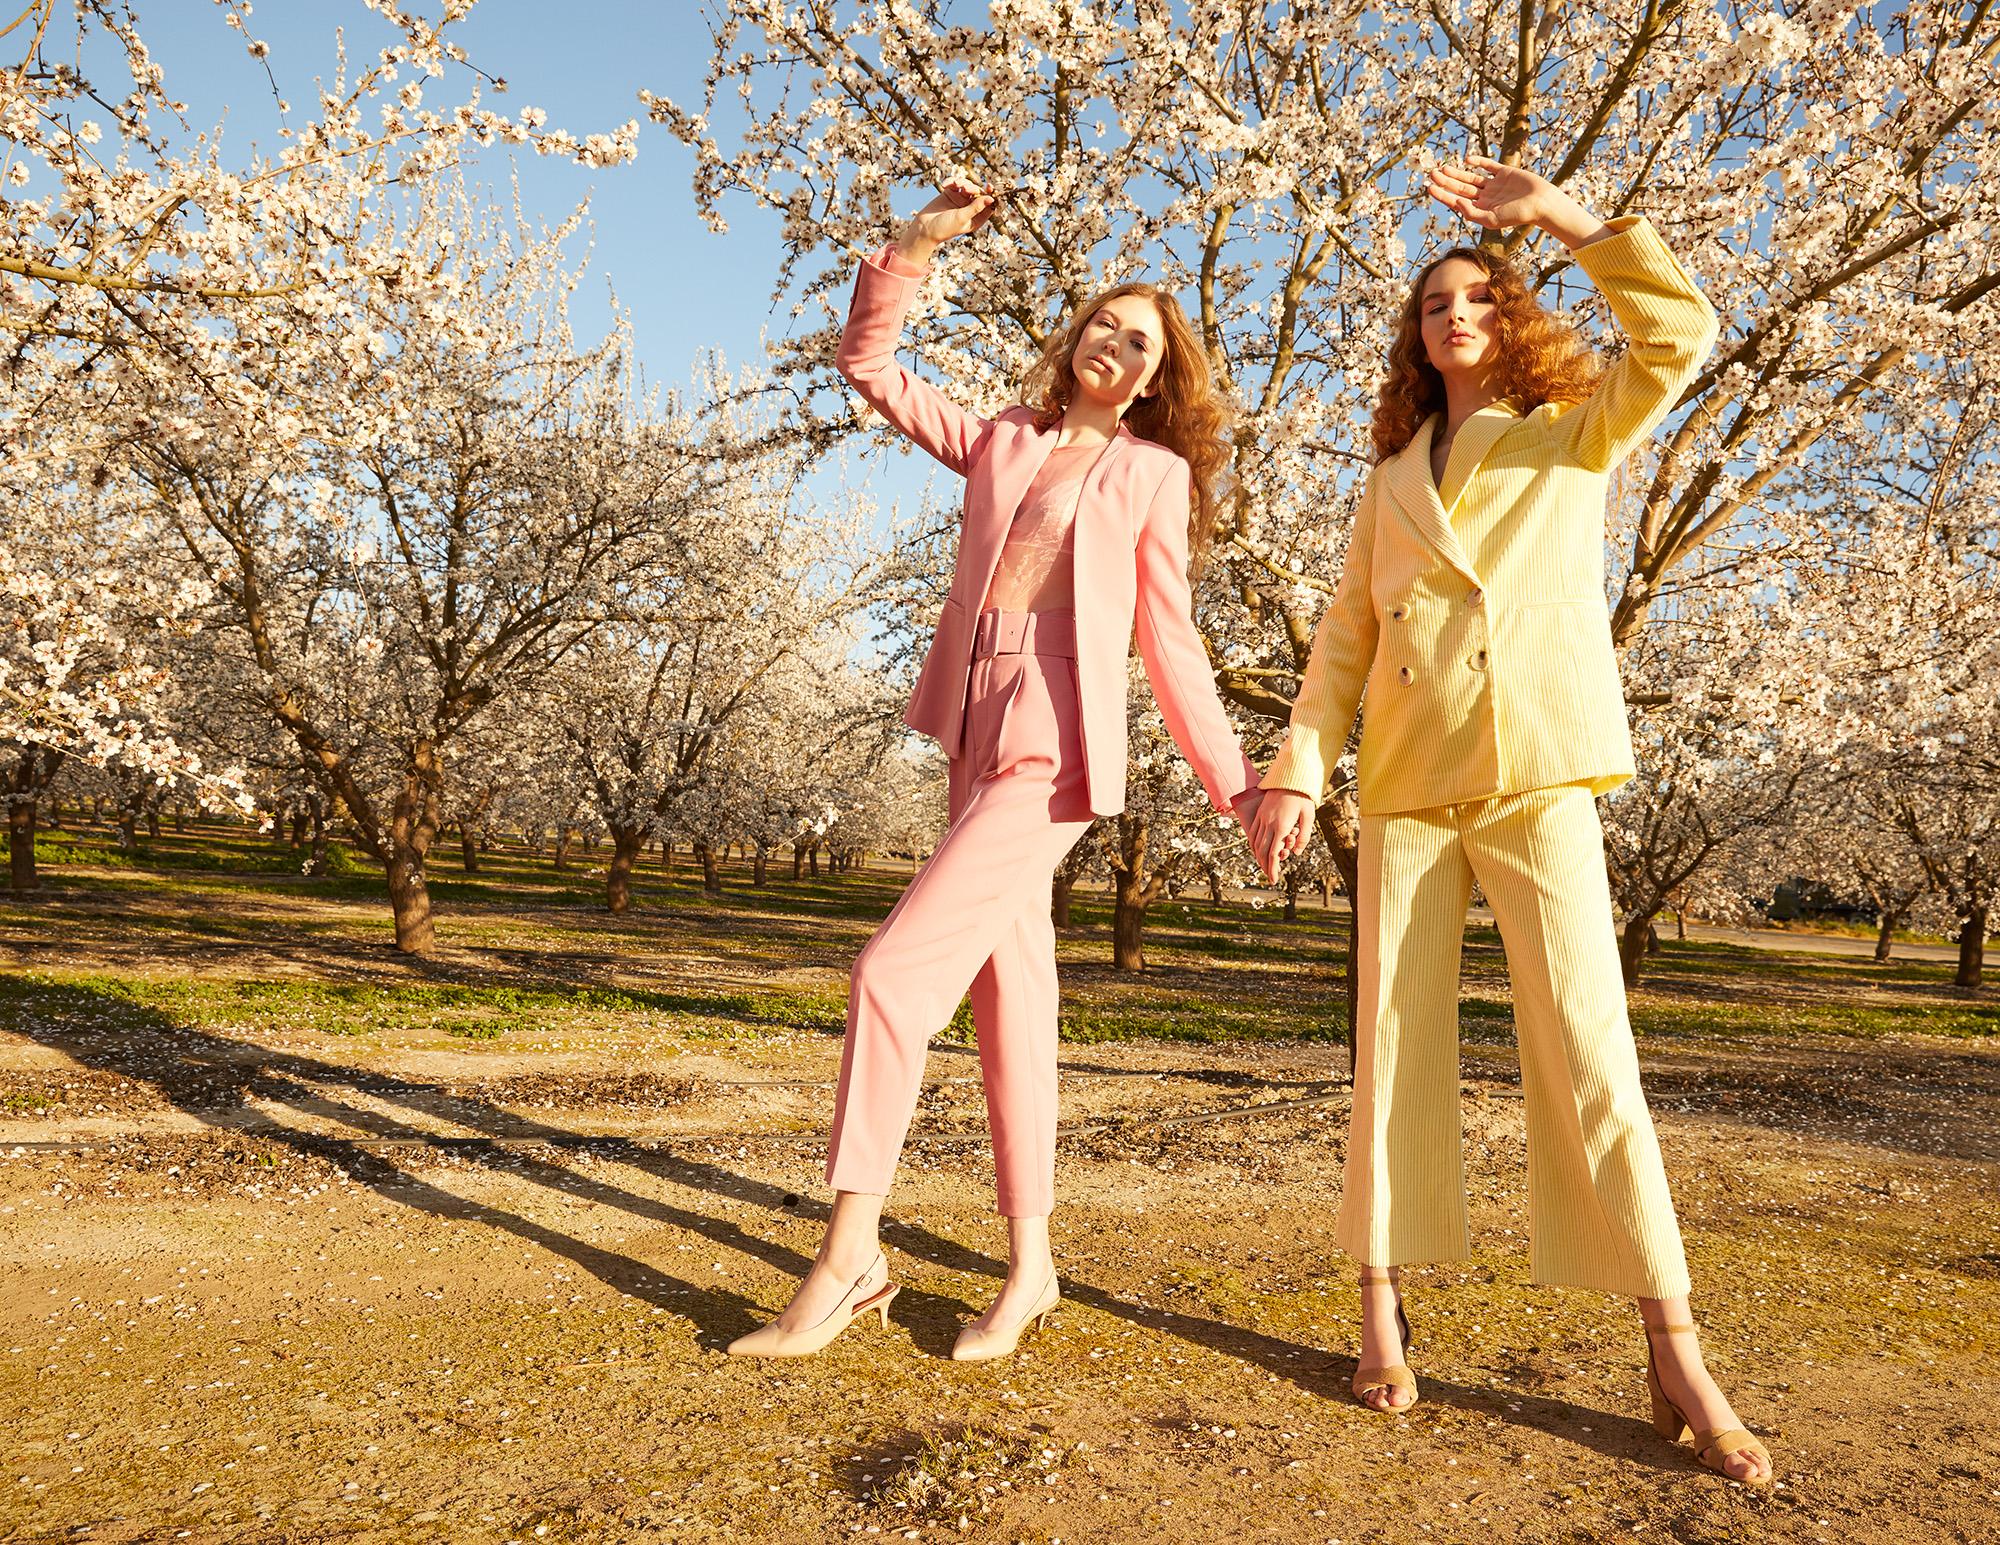 Modic Fashion Editorial - Blossom Sisters by Claudia Goetzelmann